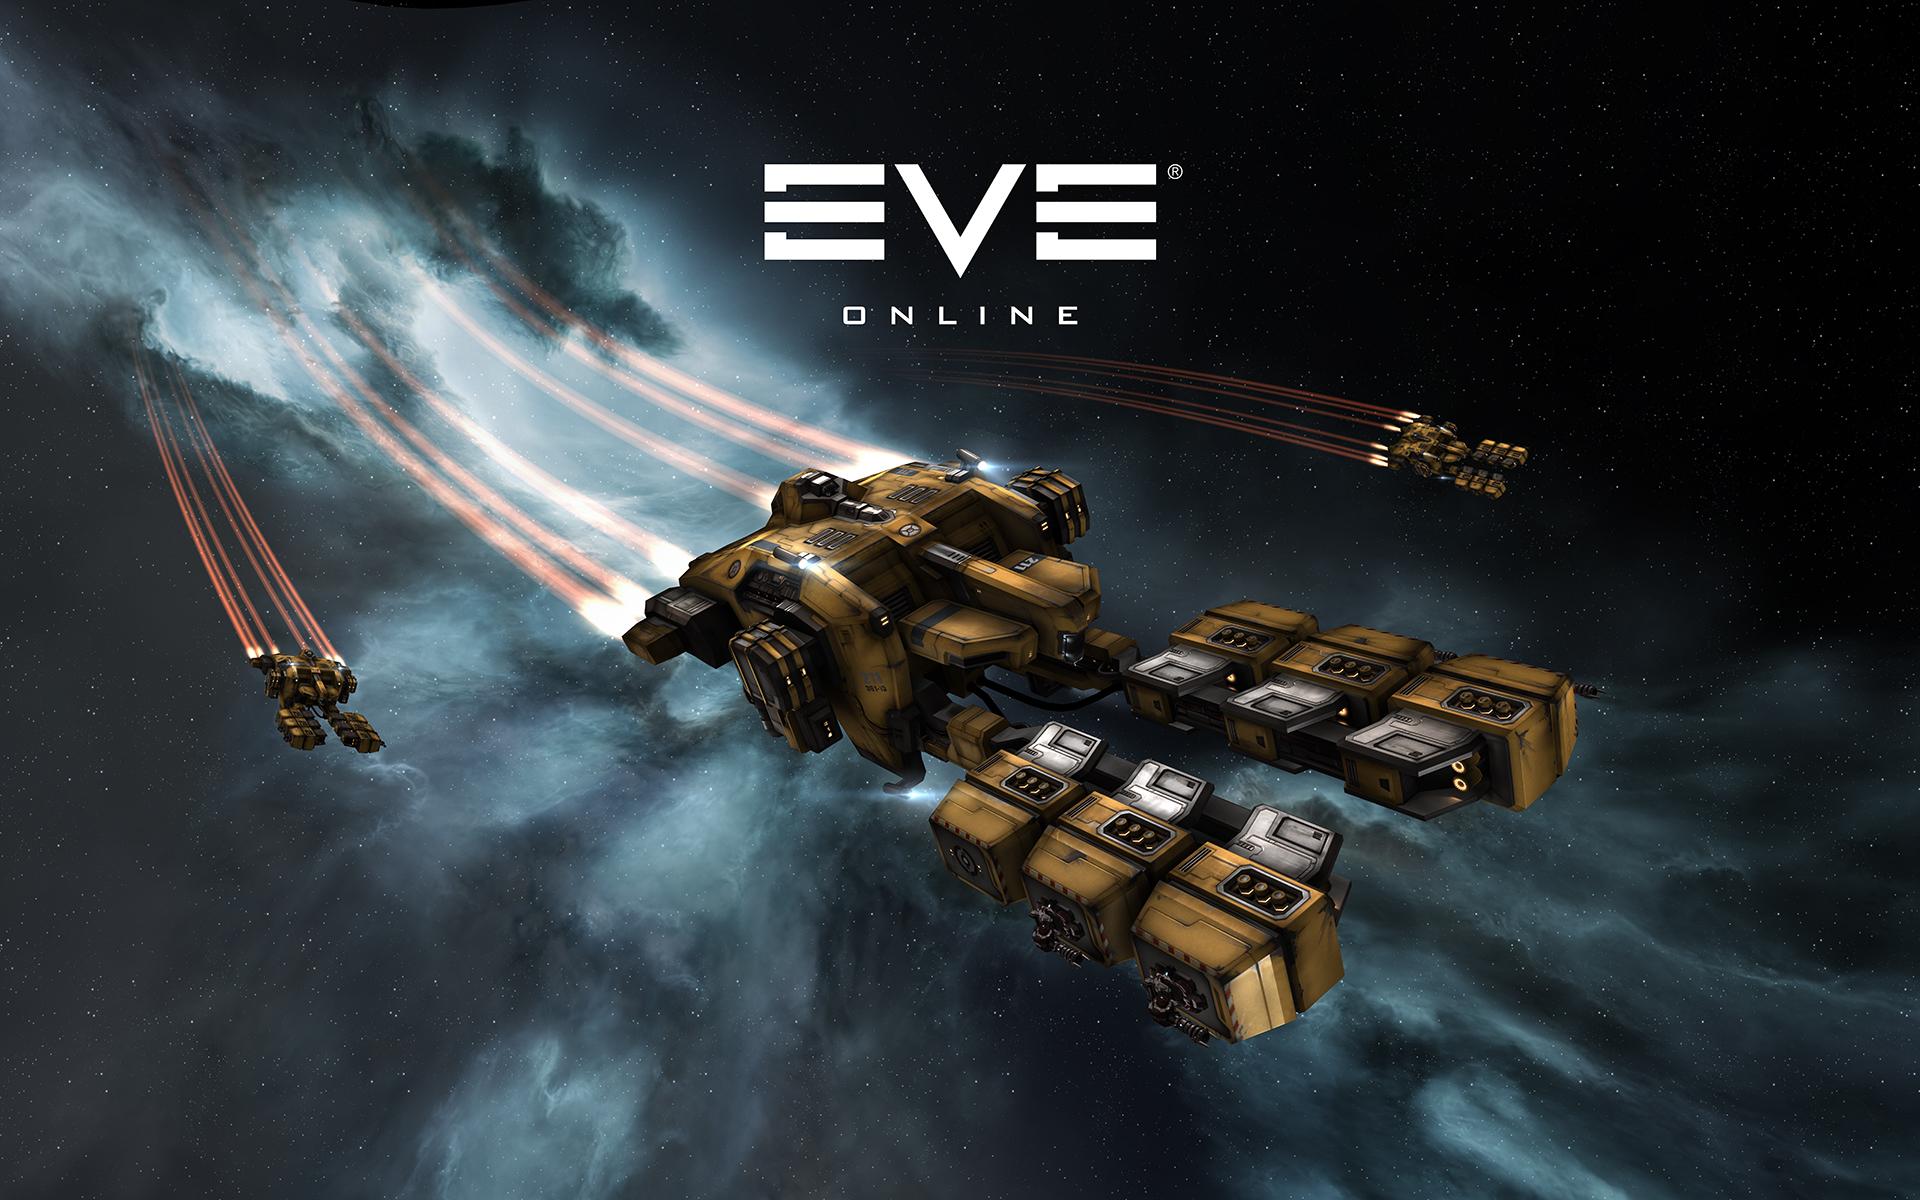 EVE Online Adopting Free-To-Play Method